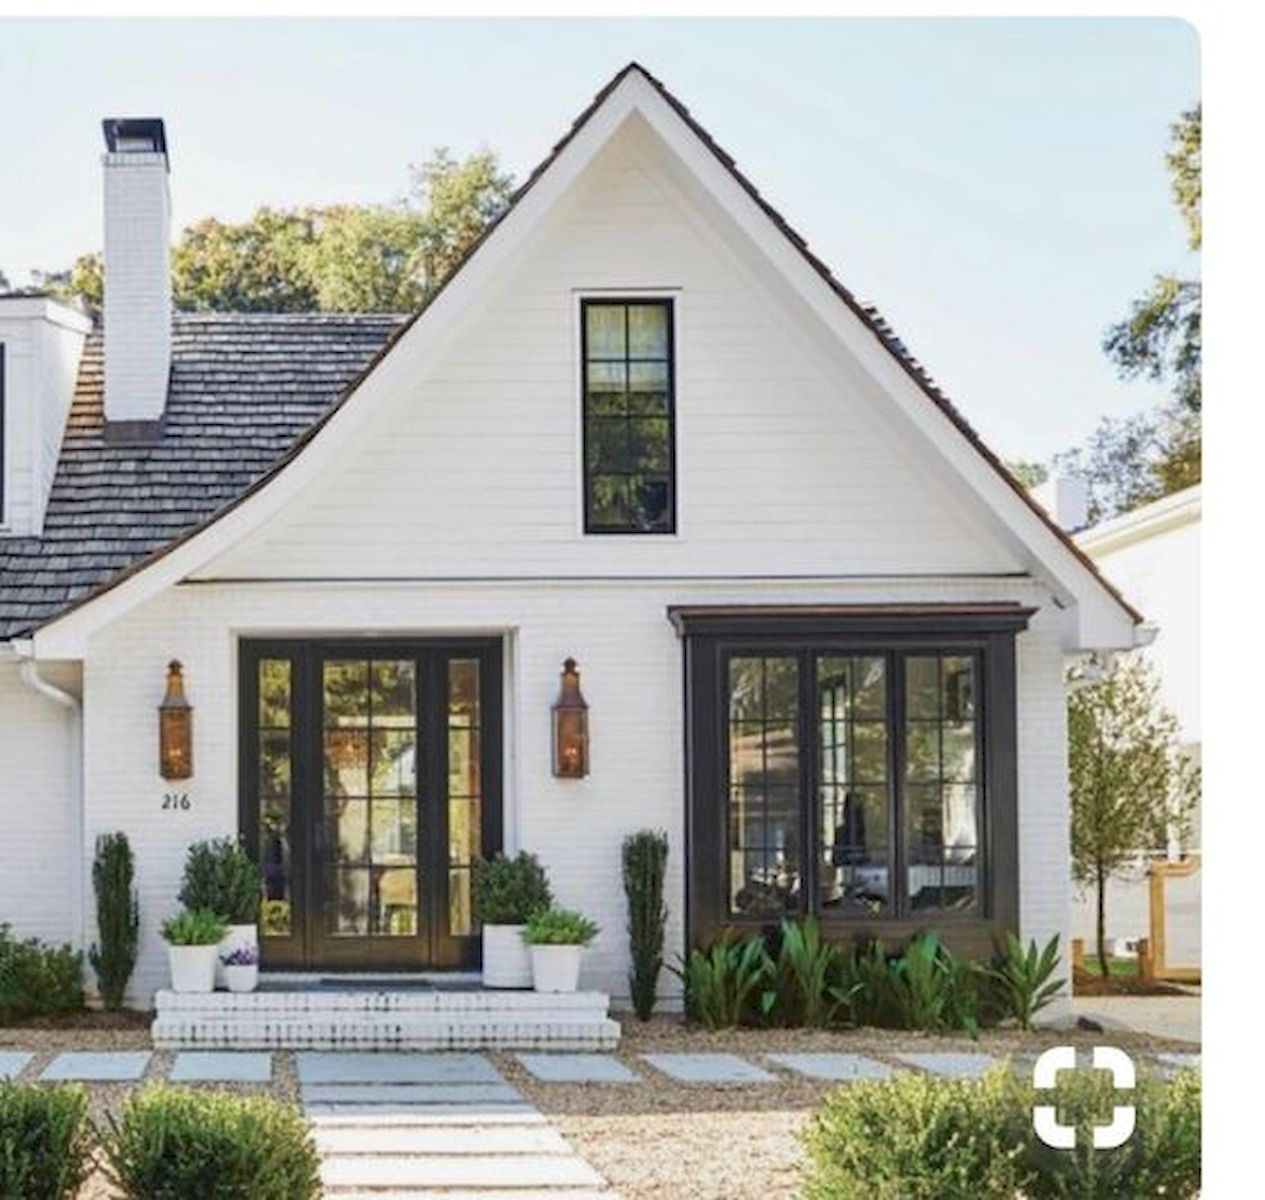 33 beautiful modern farmhouse exterior design ideas 20 in on beautiful modern farmhouse trending exterior design ideas id=77121